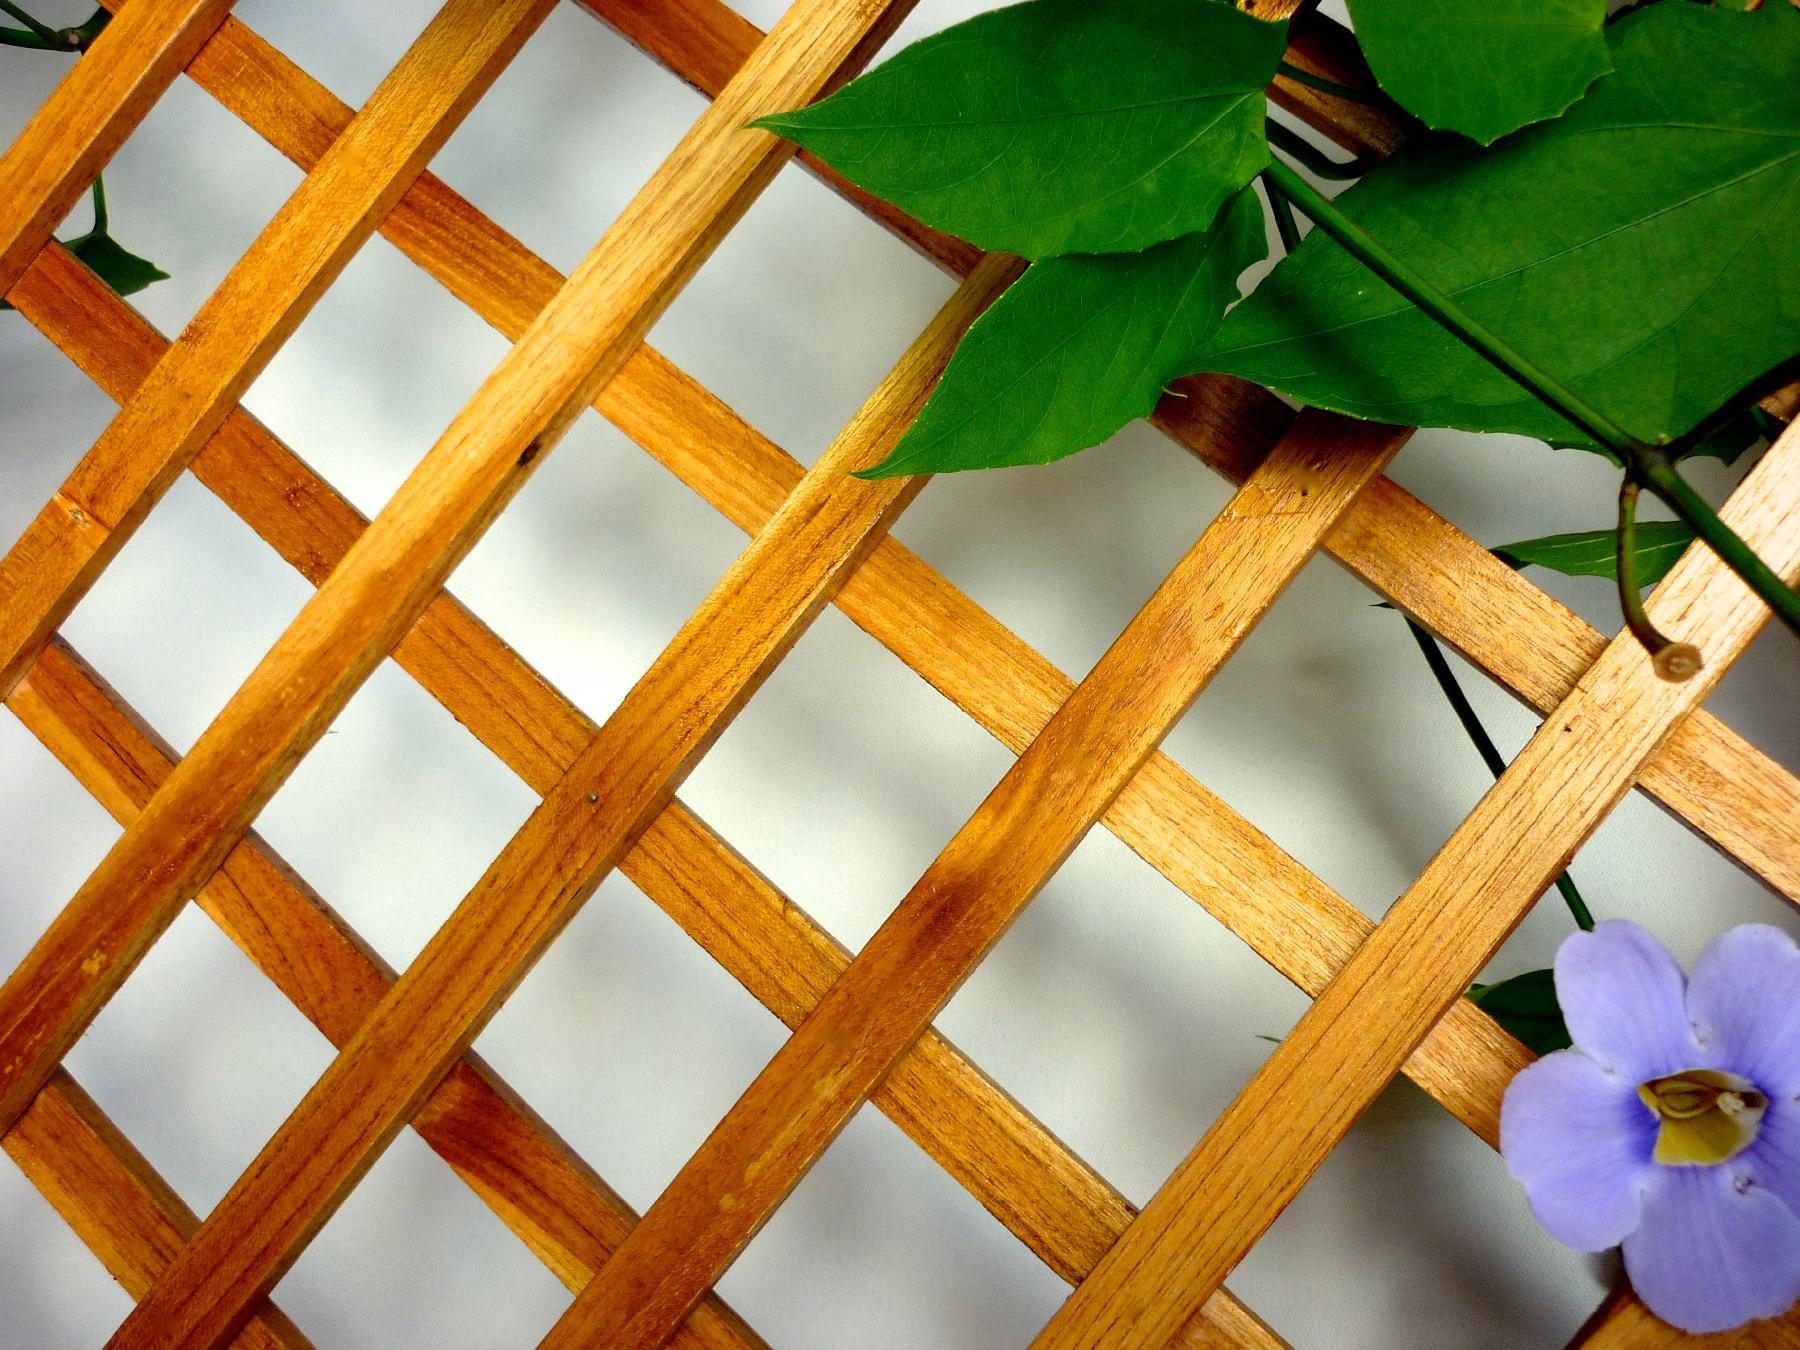 teak garden in panama,teak framework,teak lattice